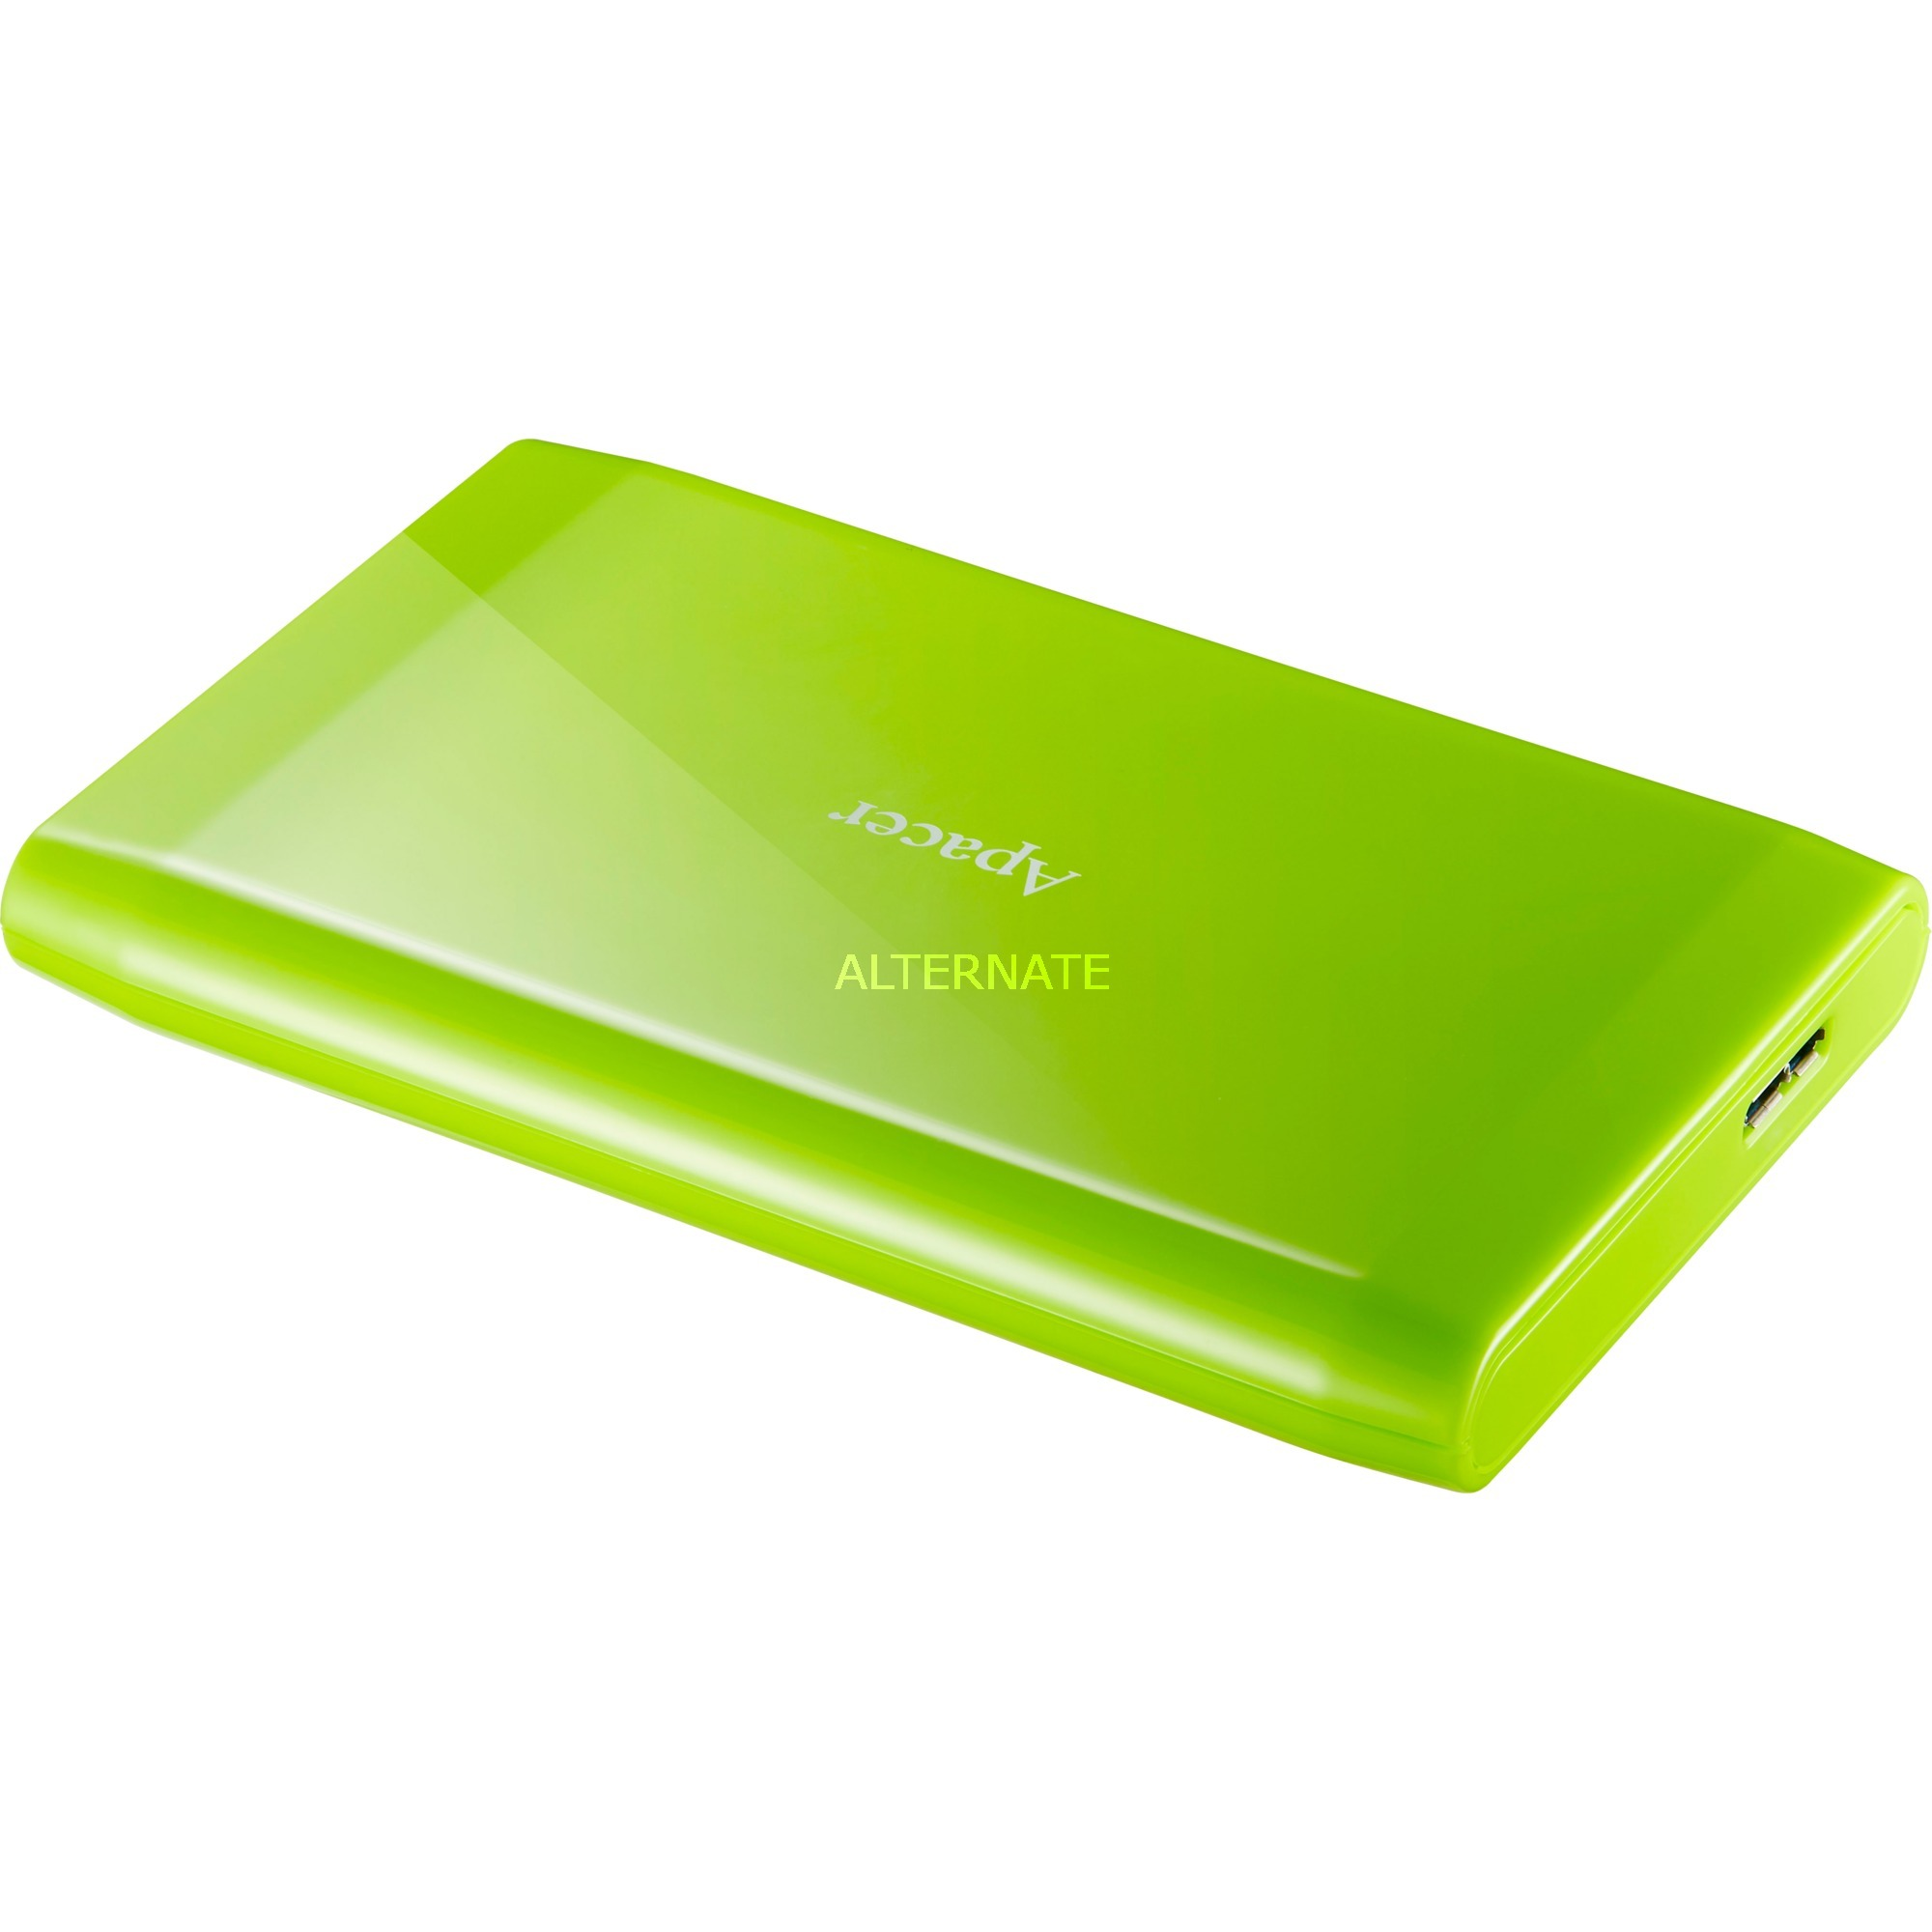 AC235 1000Go Vert disque dur externe